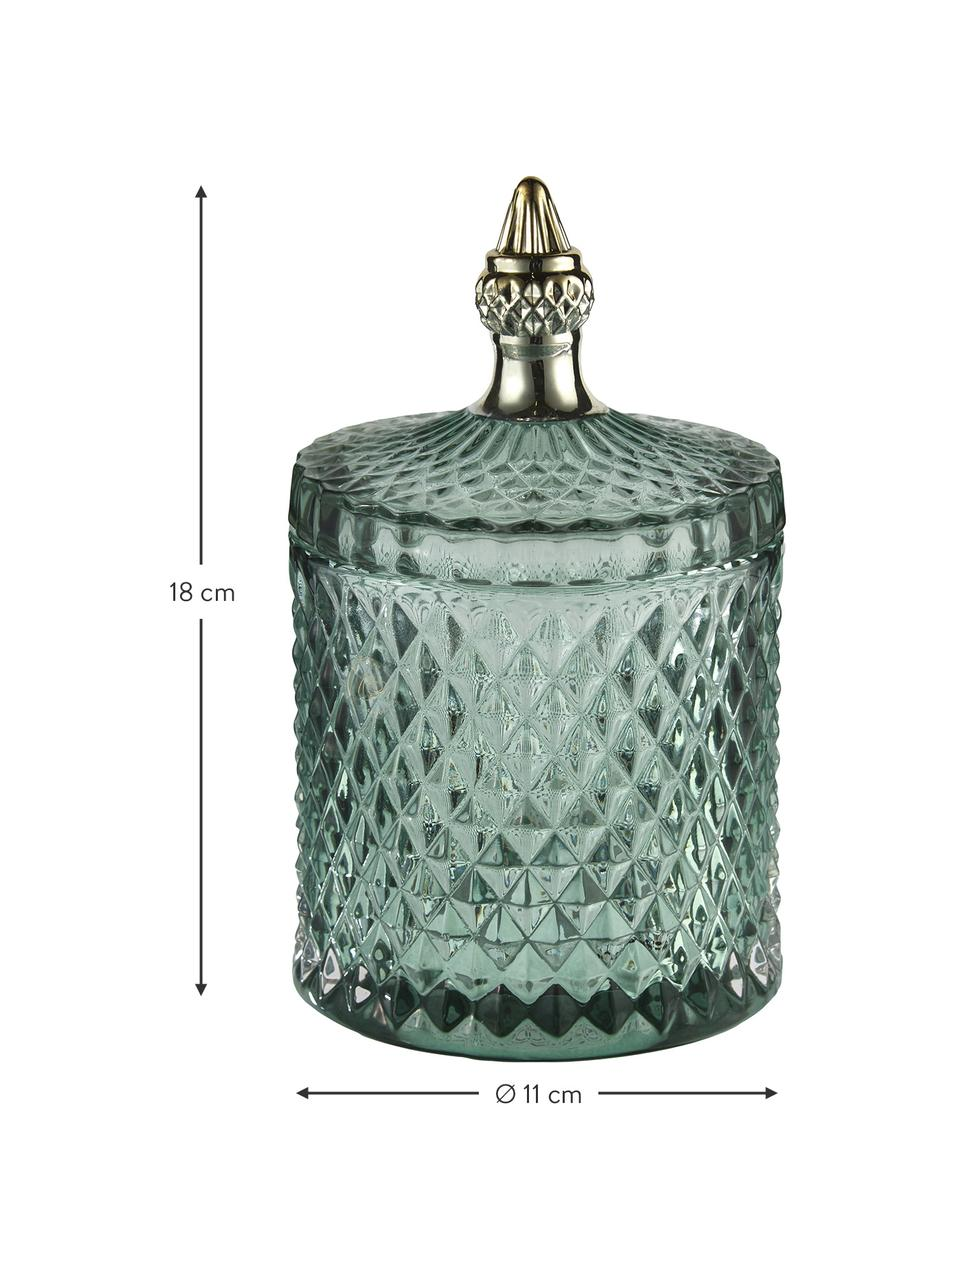 Aufbewahrungsdose Miya, Glas, Grün, Ø 11 x H 18 cm